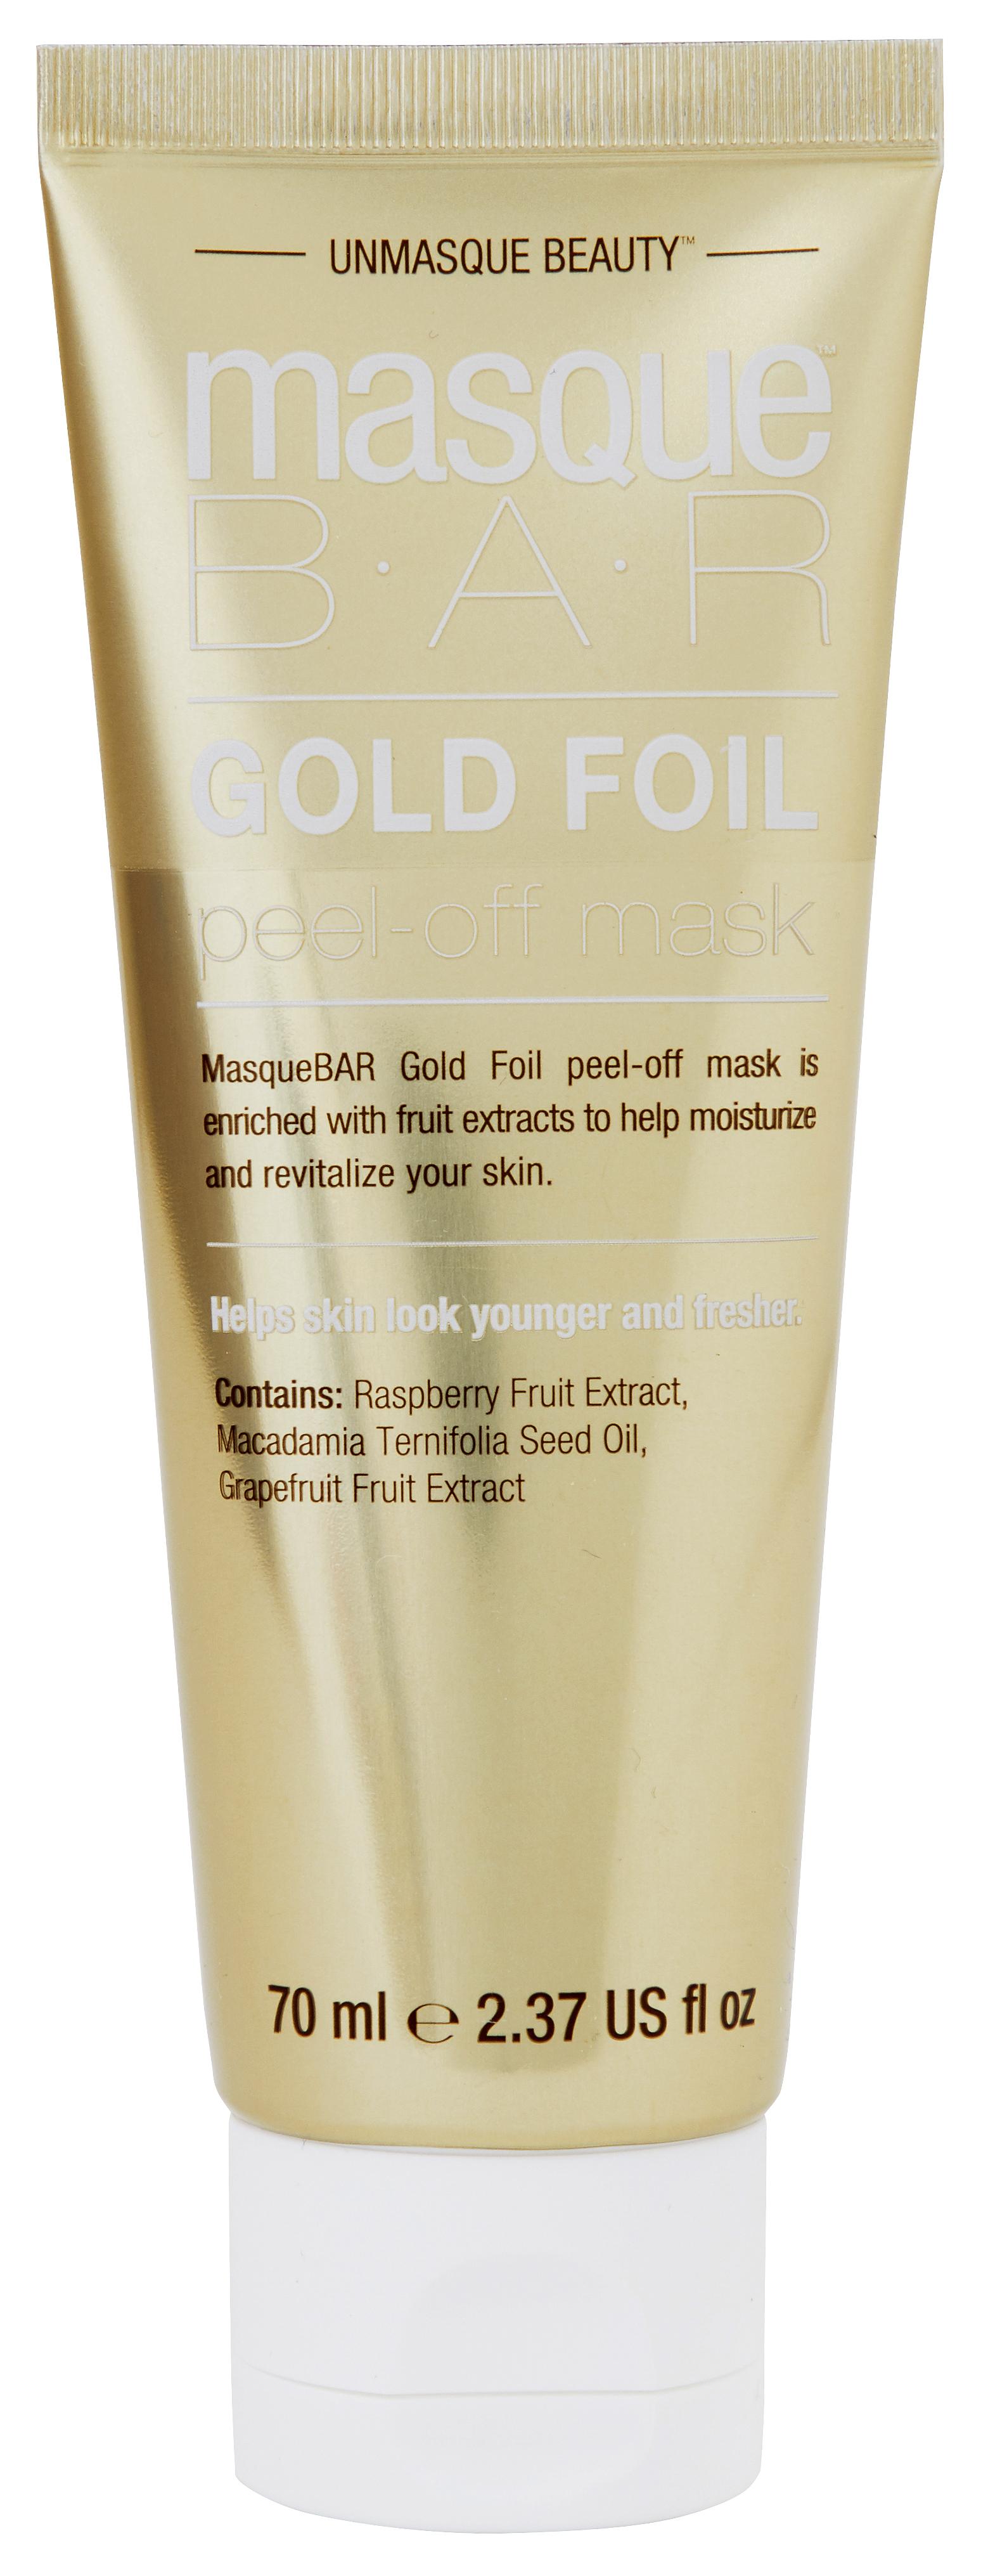 Gold Foil Peel-Off Mask Tube